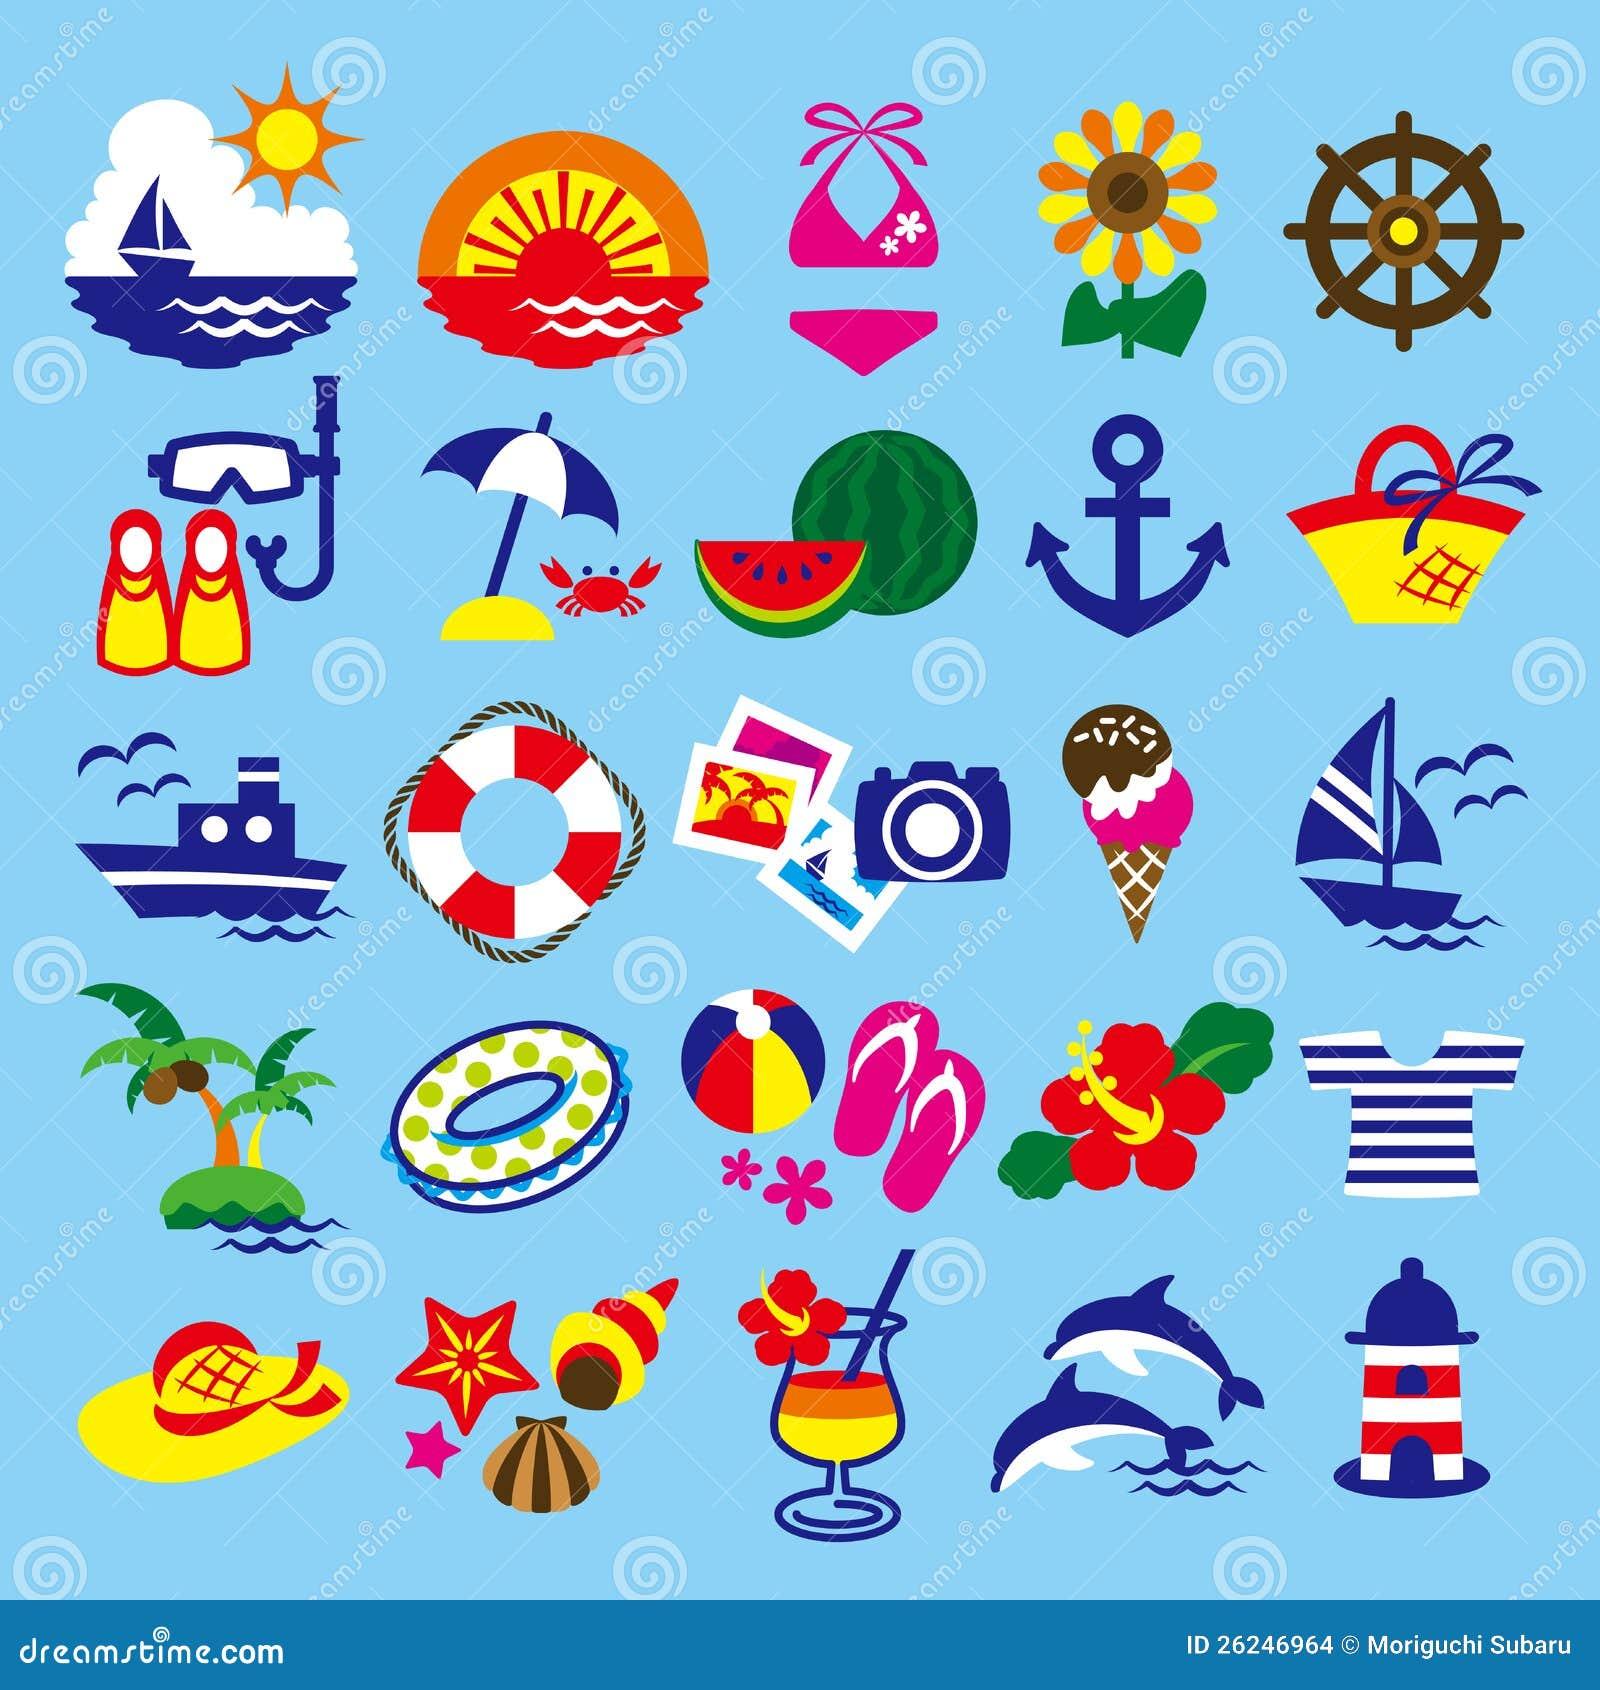 Clip Art Clip Art Summer clip art summer stock images image 26246964 summer